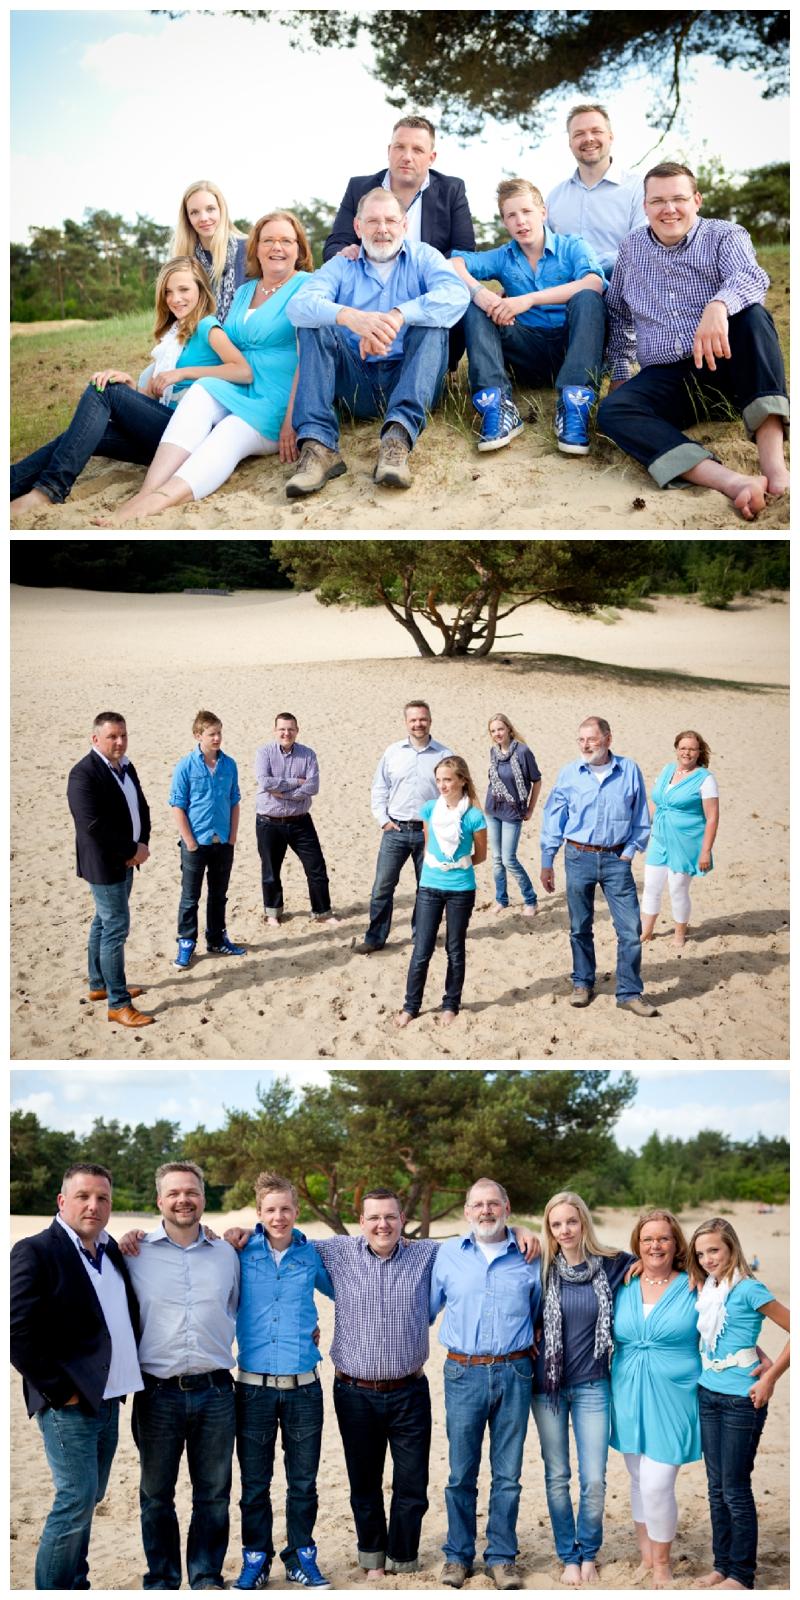 Familyshoot-Leeuwestein-DeboraYariFotografie03.jpg